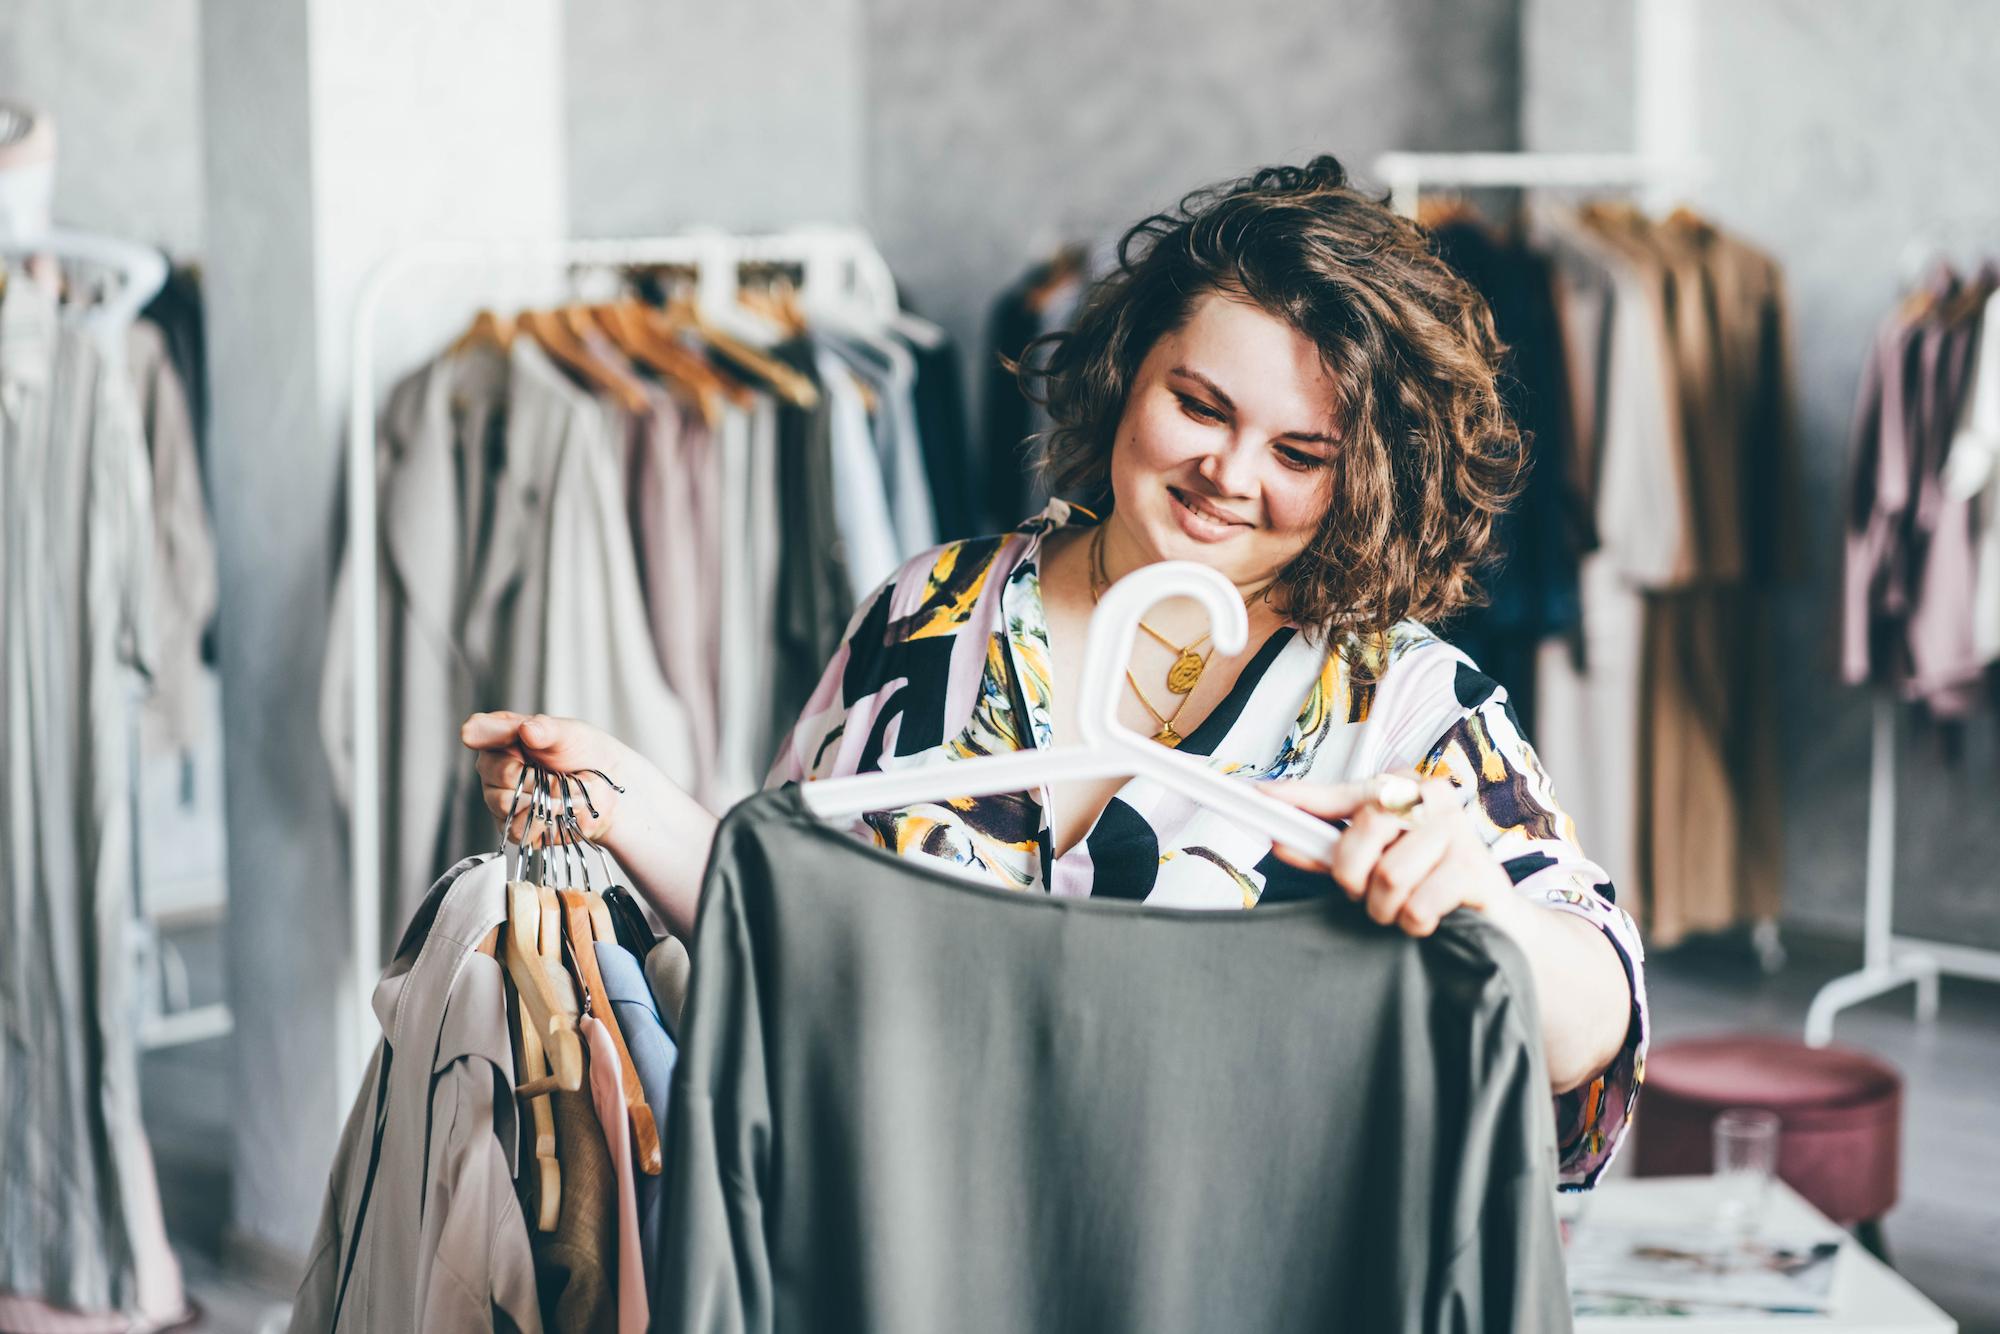 Plus Size Woman Choose Fashioned Dress in Store. Plus size women shopping.